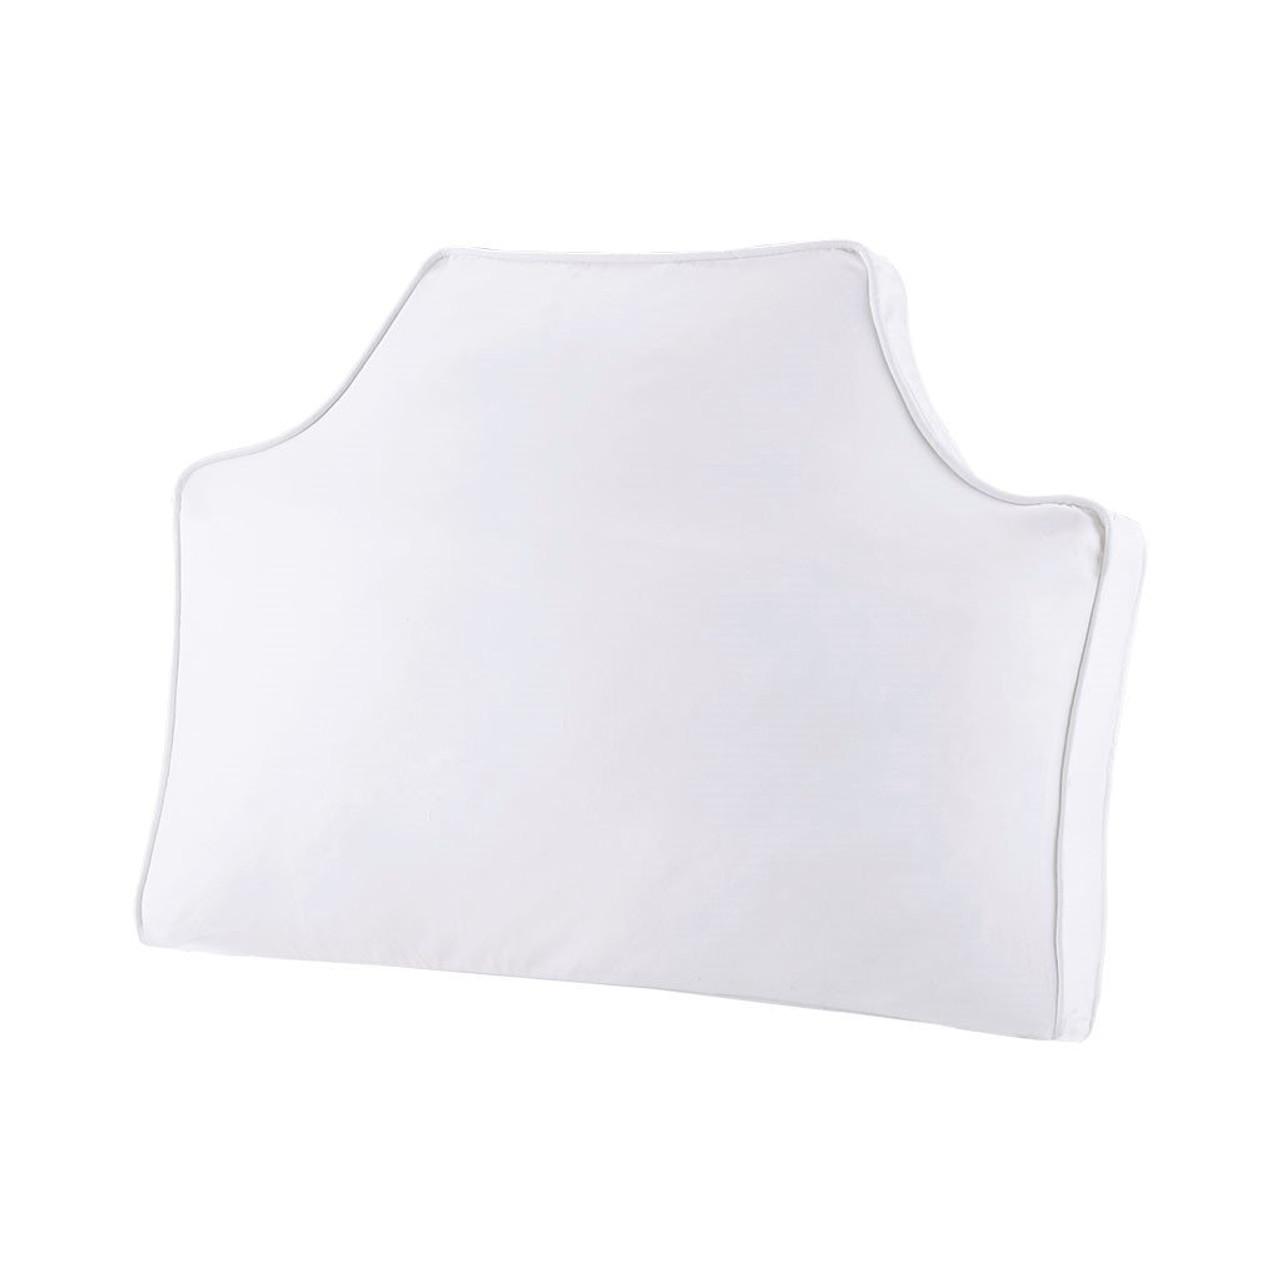 intelligent design oversized headboard 100 cotton canvas pillow id30 1481